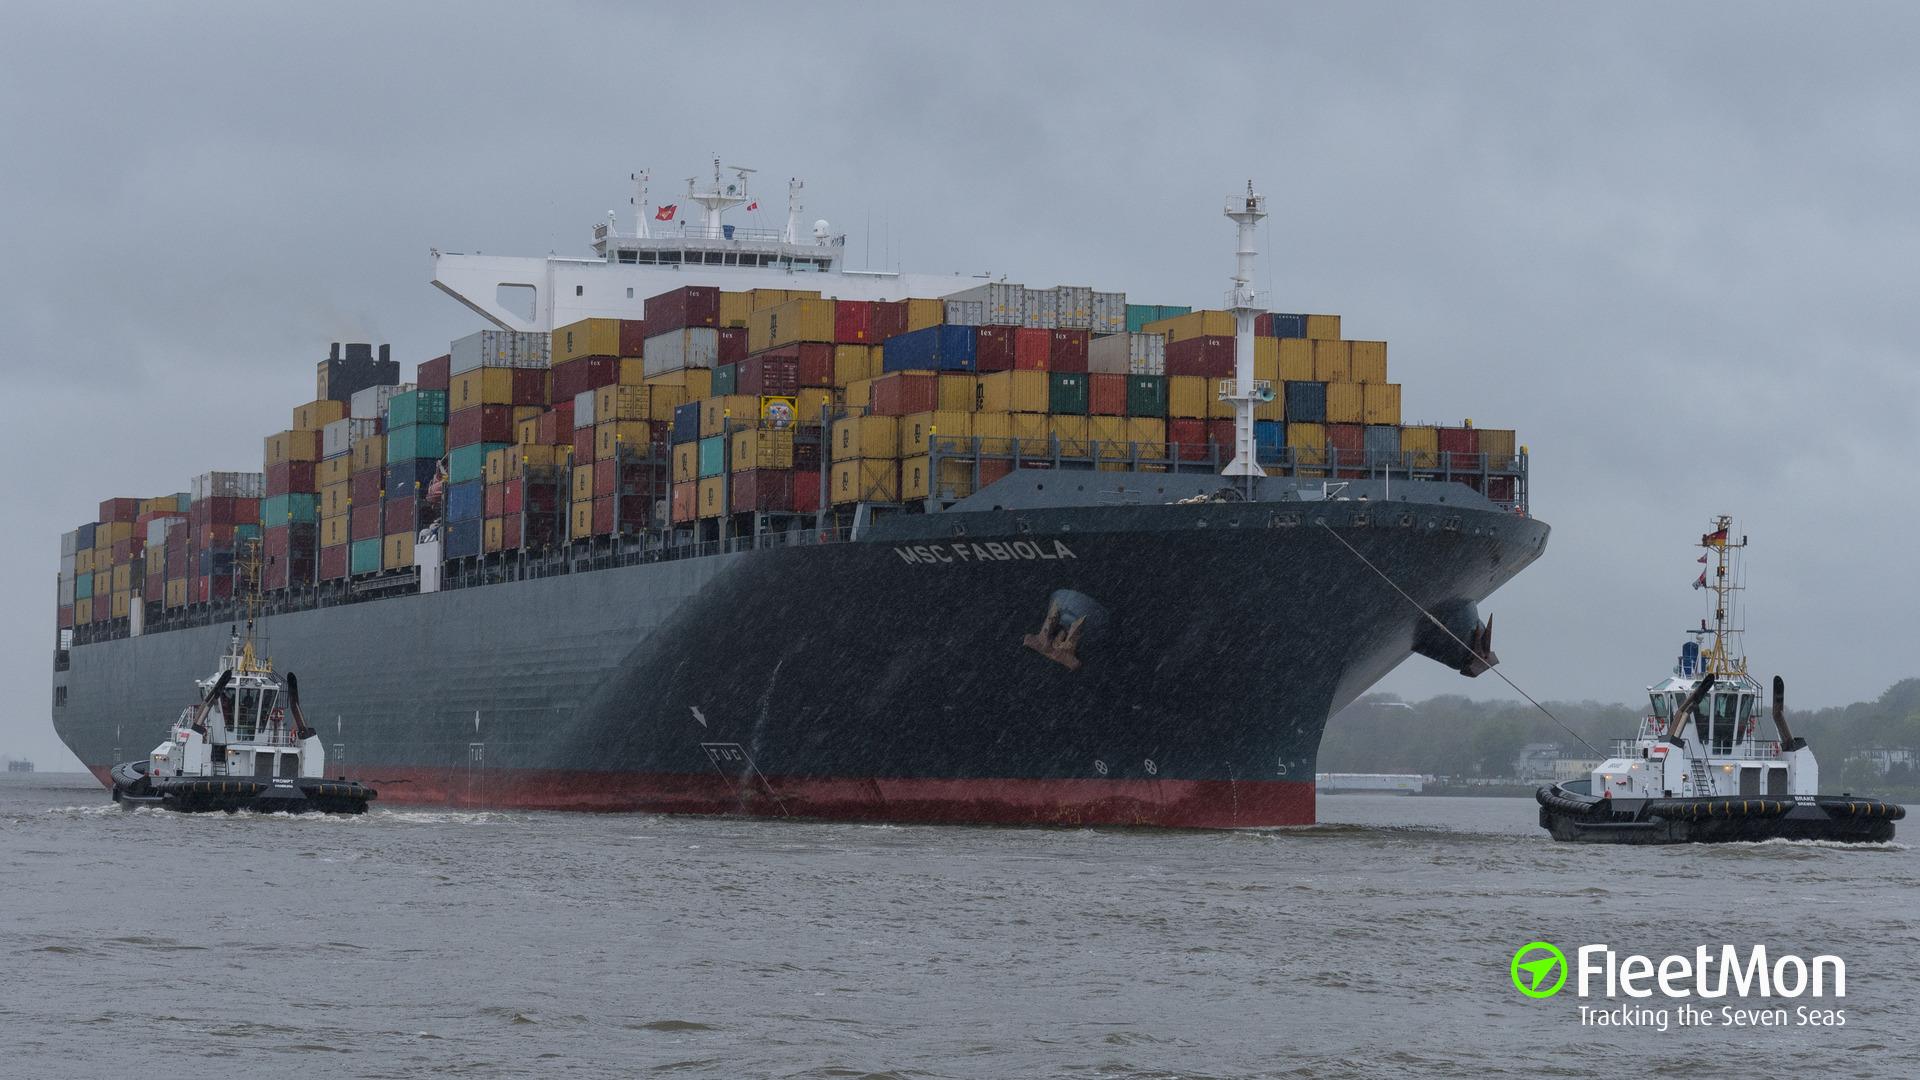 Mega container ship MSC FABIOLA hard aground in Suez Canal: UPDATE